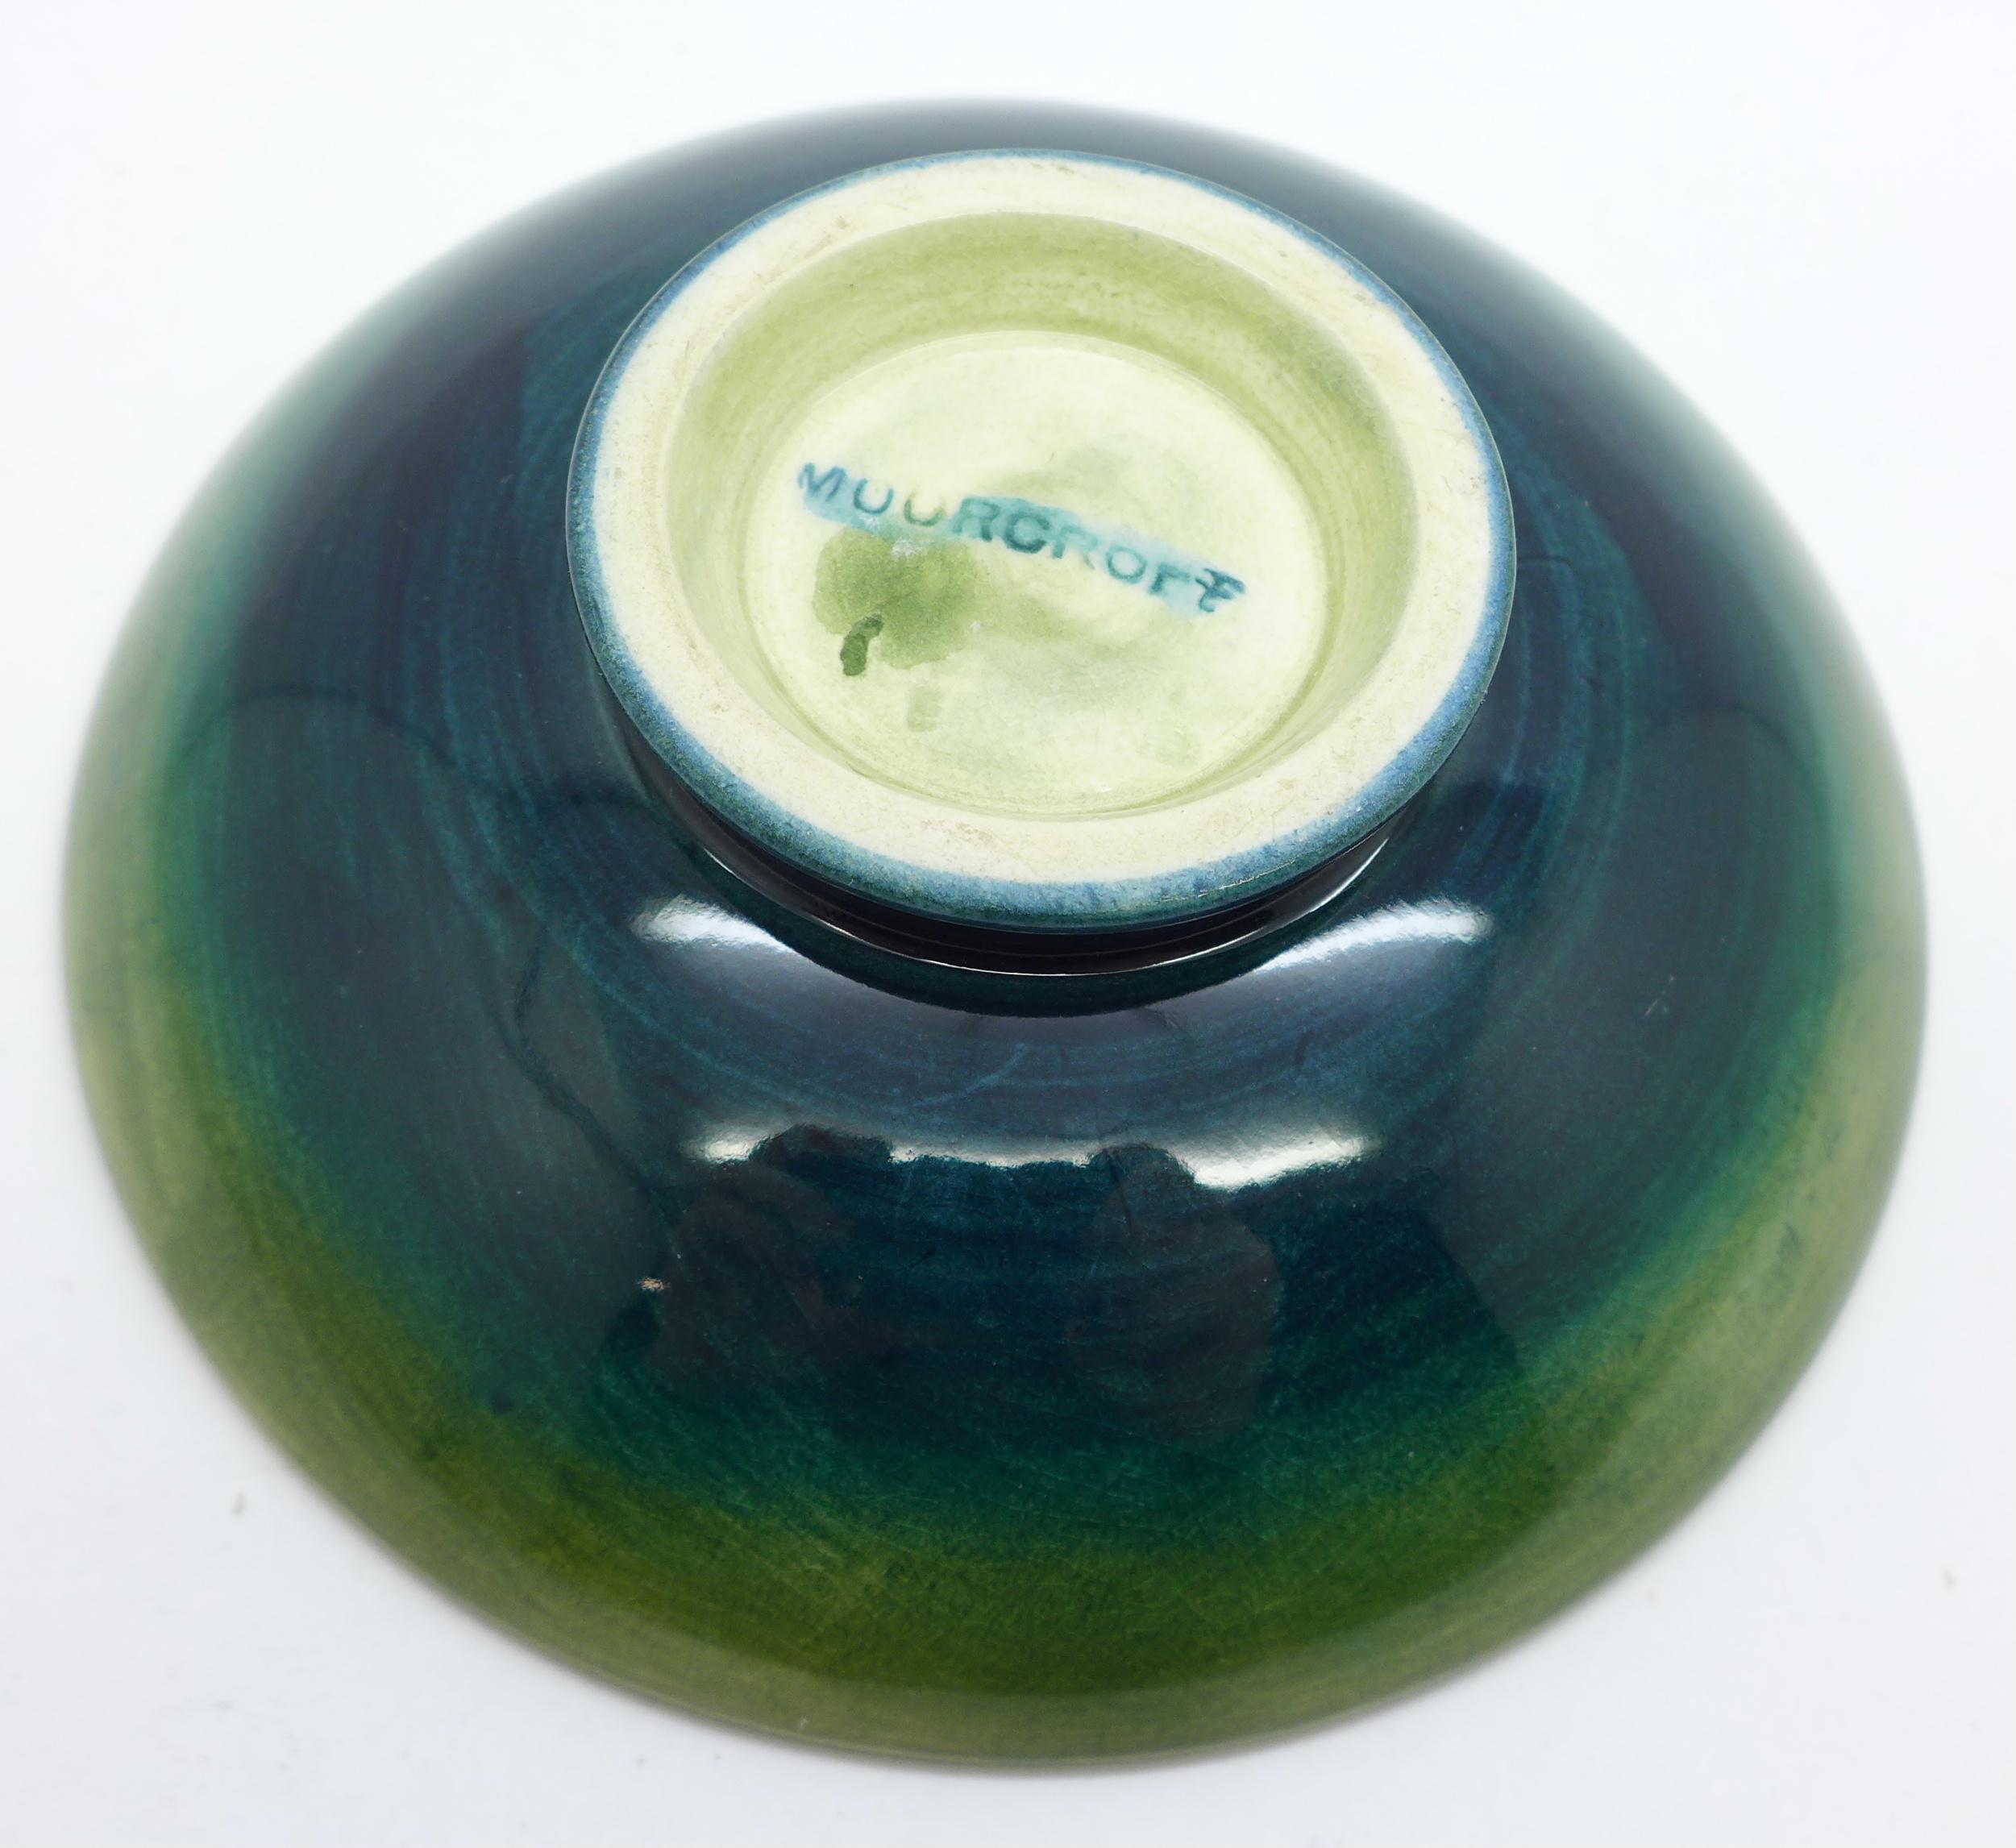 A Moorcroft freesia dish, 108mm diameter - Image 3 of 3